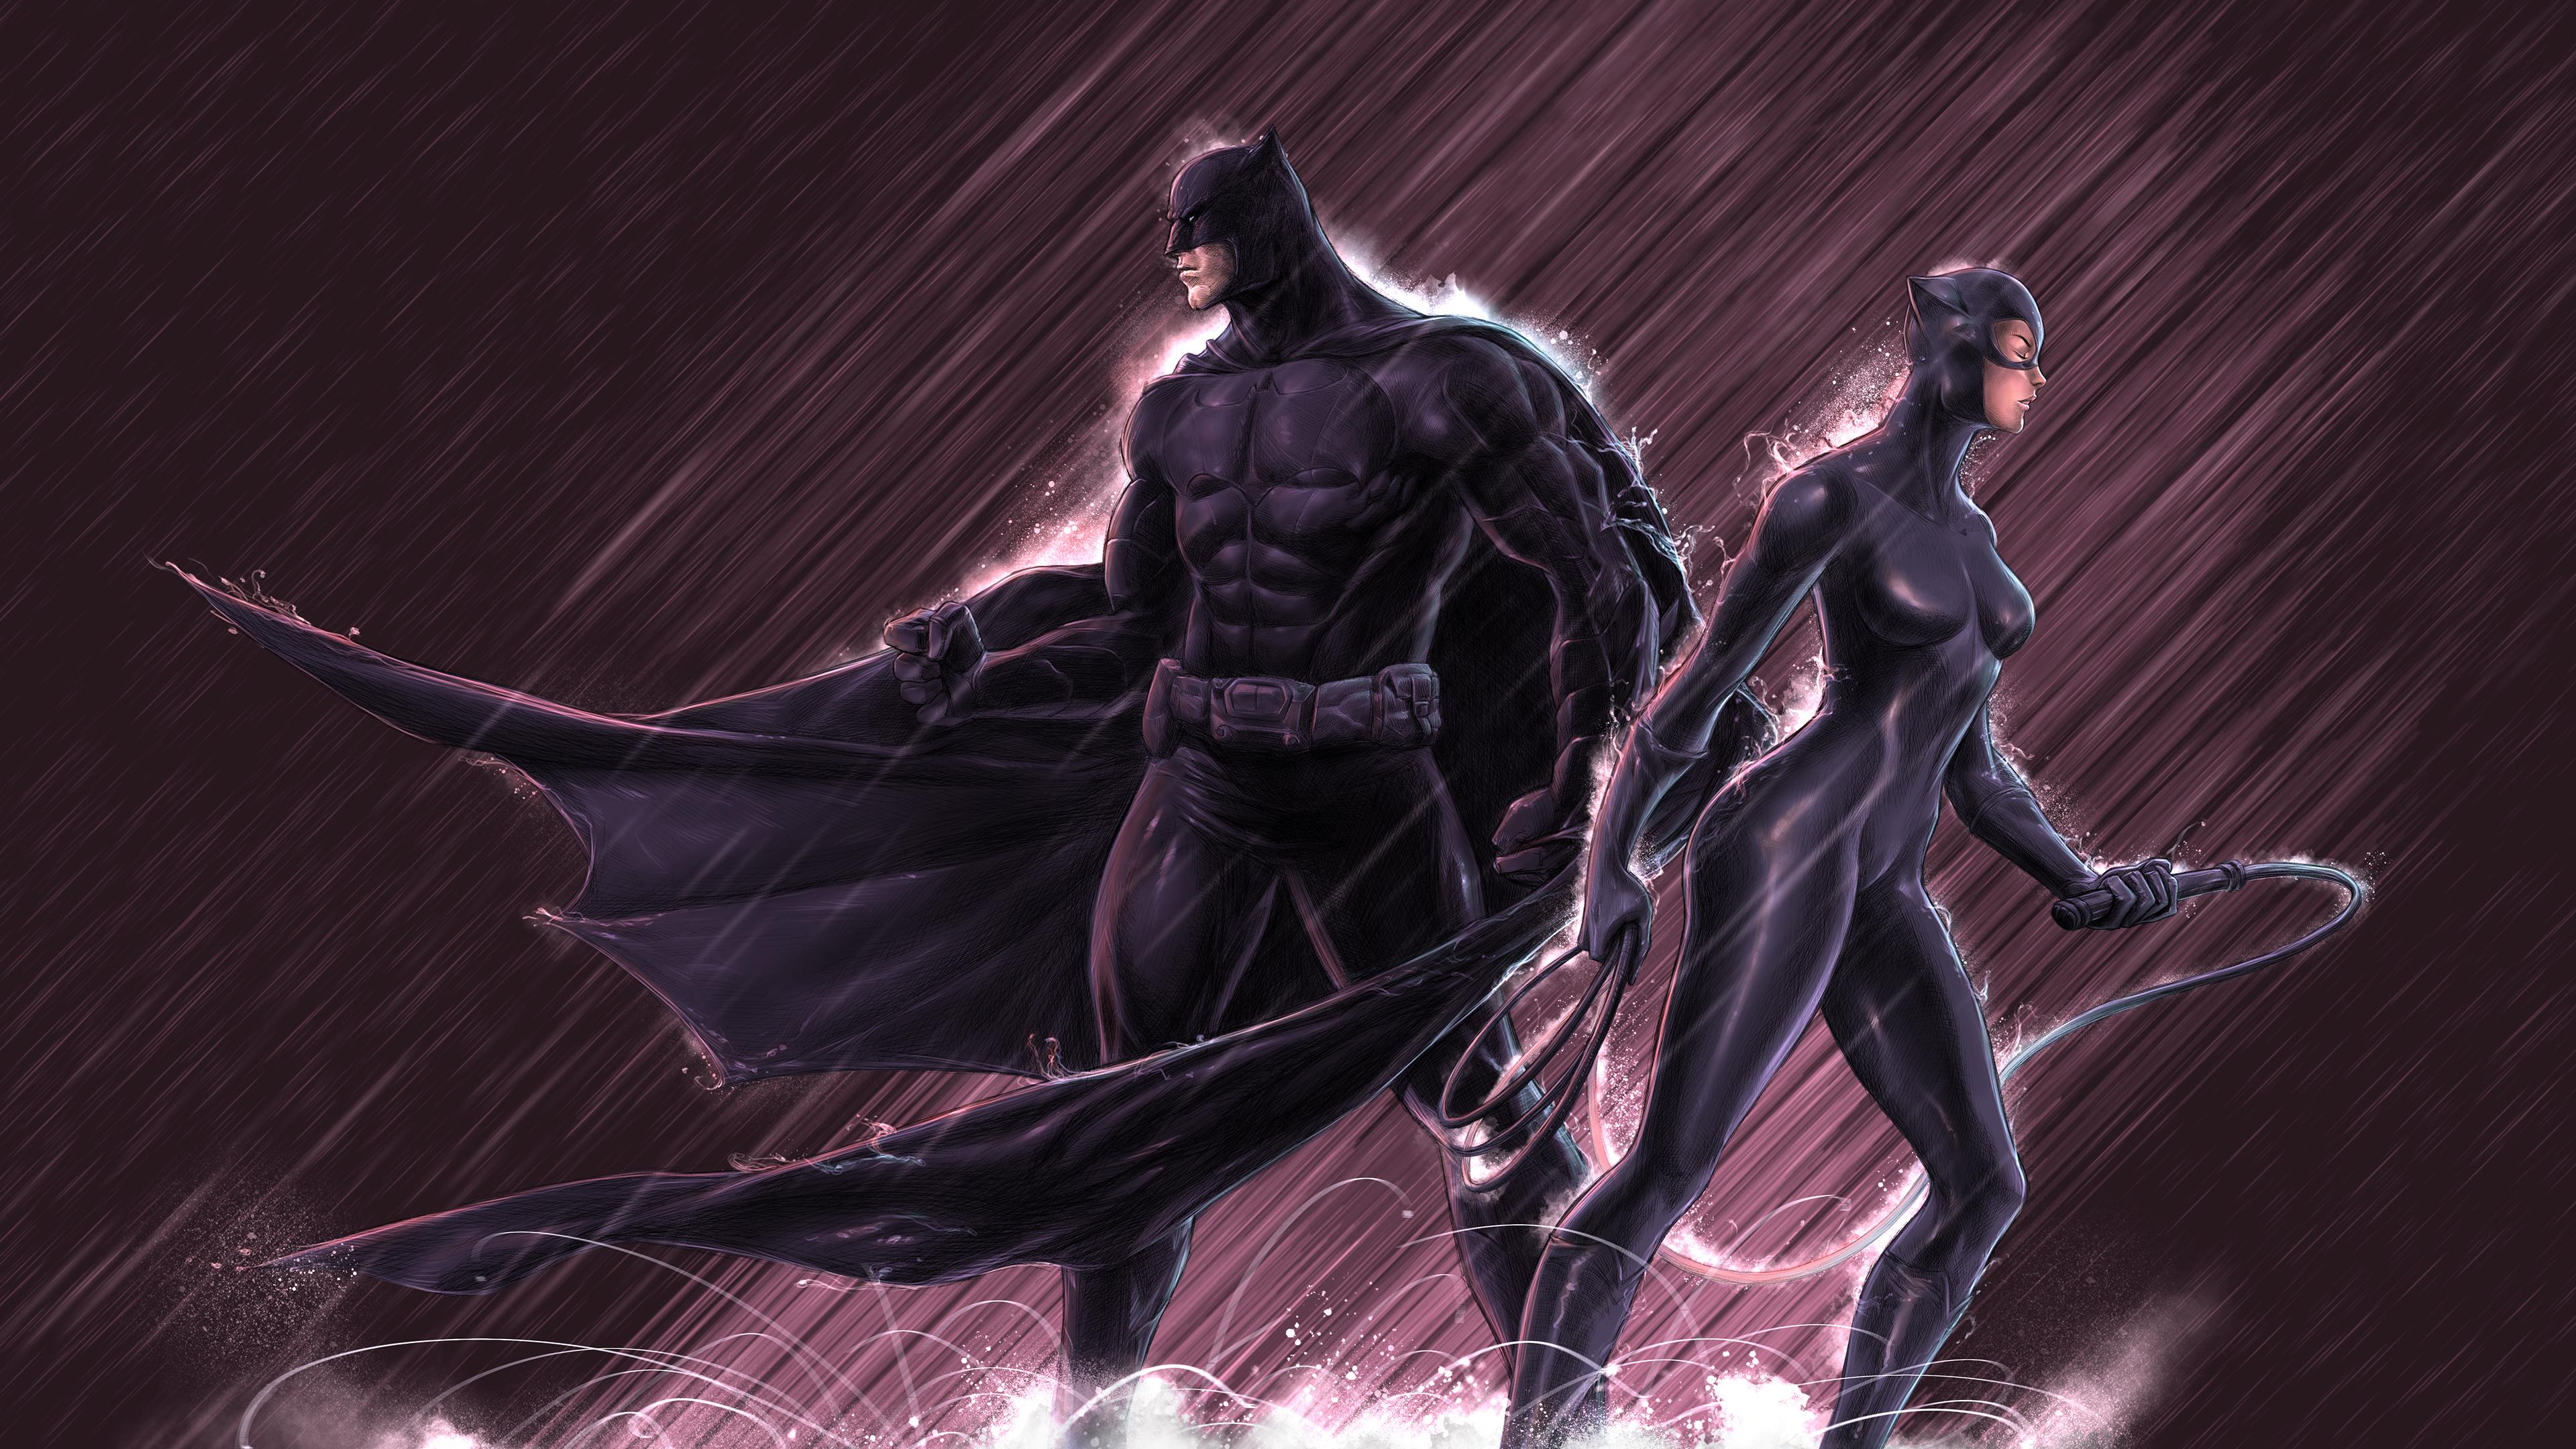 batman catwoman 1568054469 - Batman Catwoman - superheroes wallpapers, hd-wallpapers, digital art wallpapers, catwoman wallpapers, behance wallpapers, batman wallpapers, artwork wallpapers, 4k-wallpapers